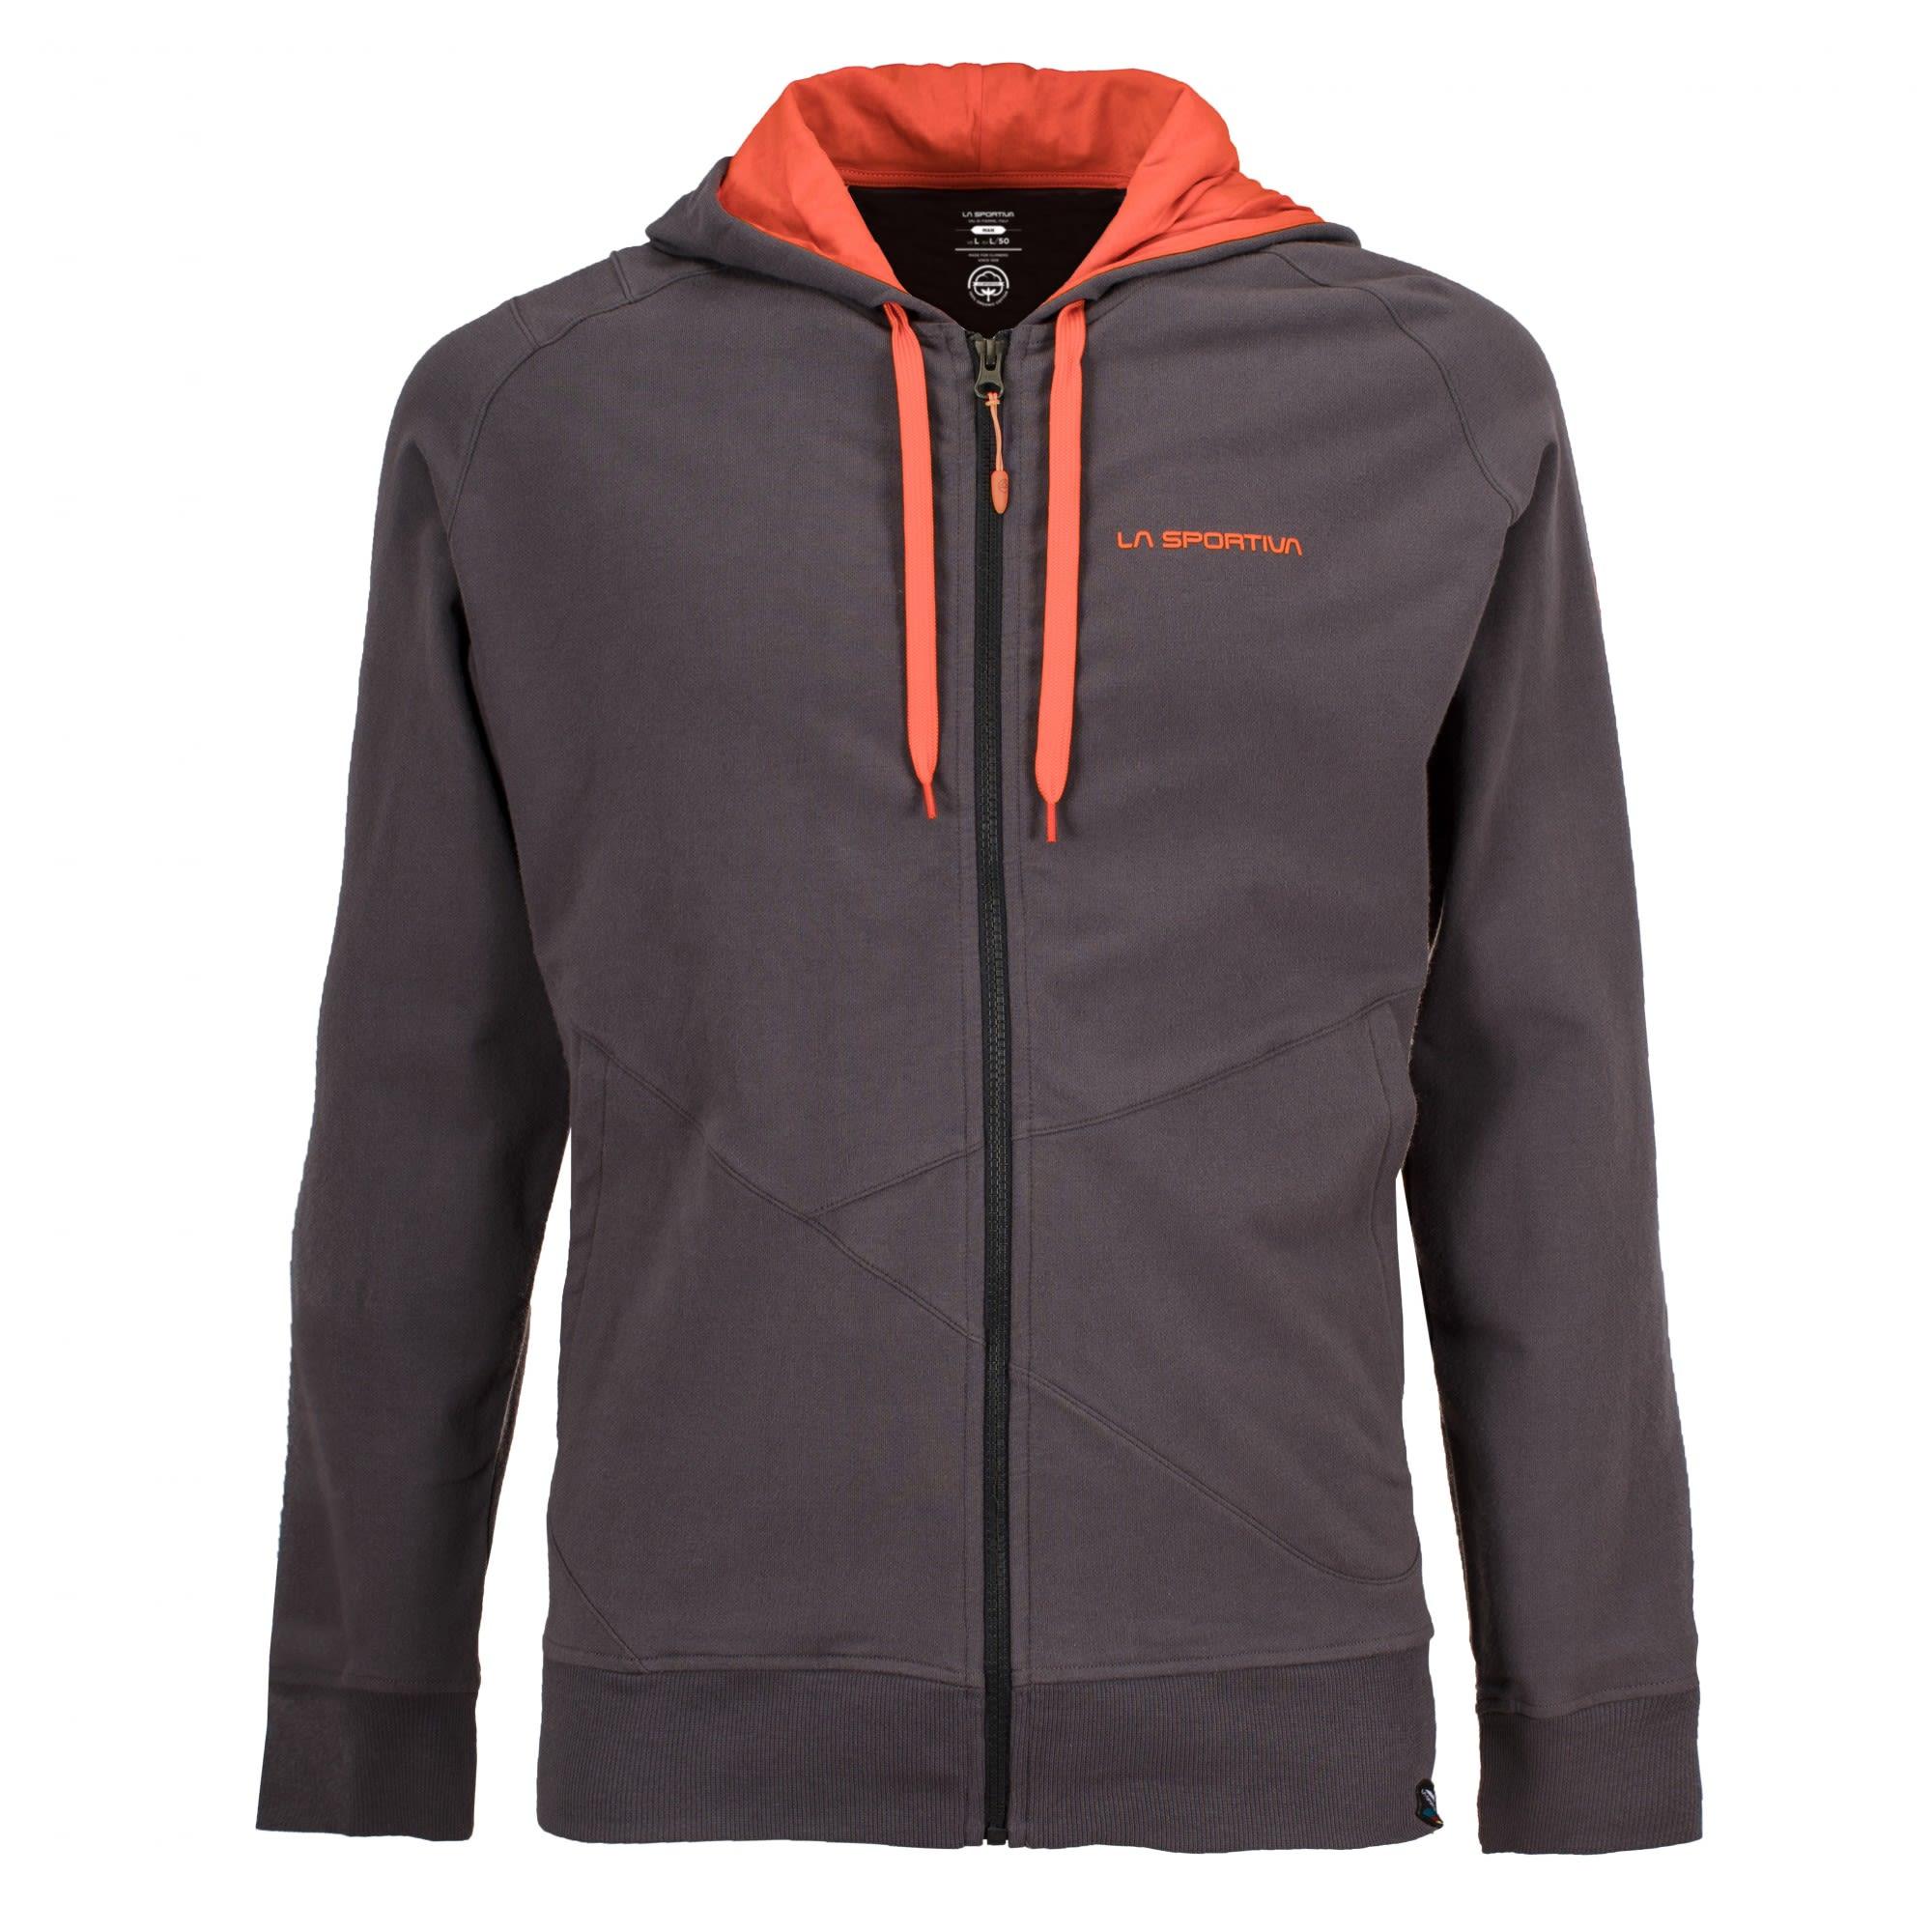 La Sportiva Rocklands Hoody Orange, Male Freizeitpullover, XXL